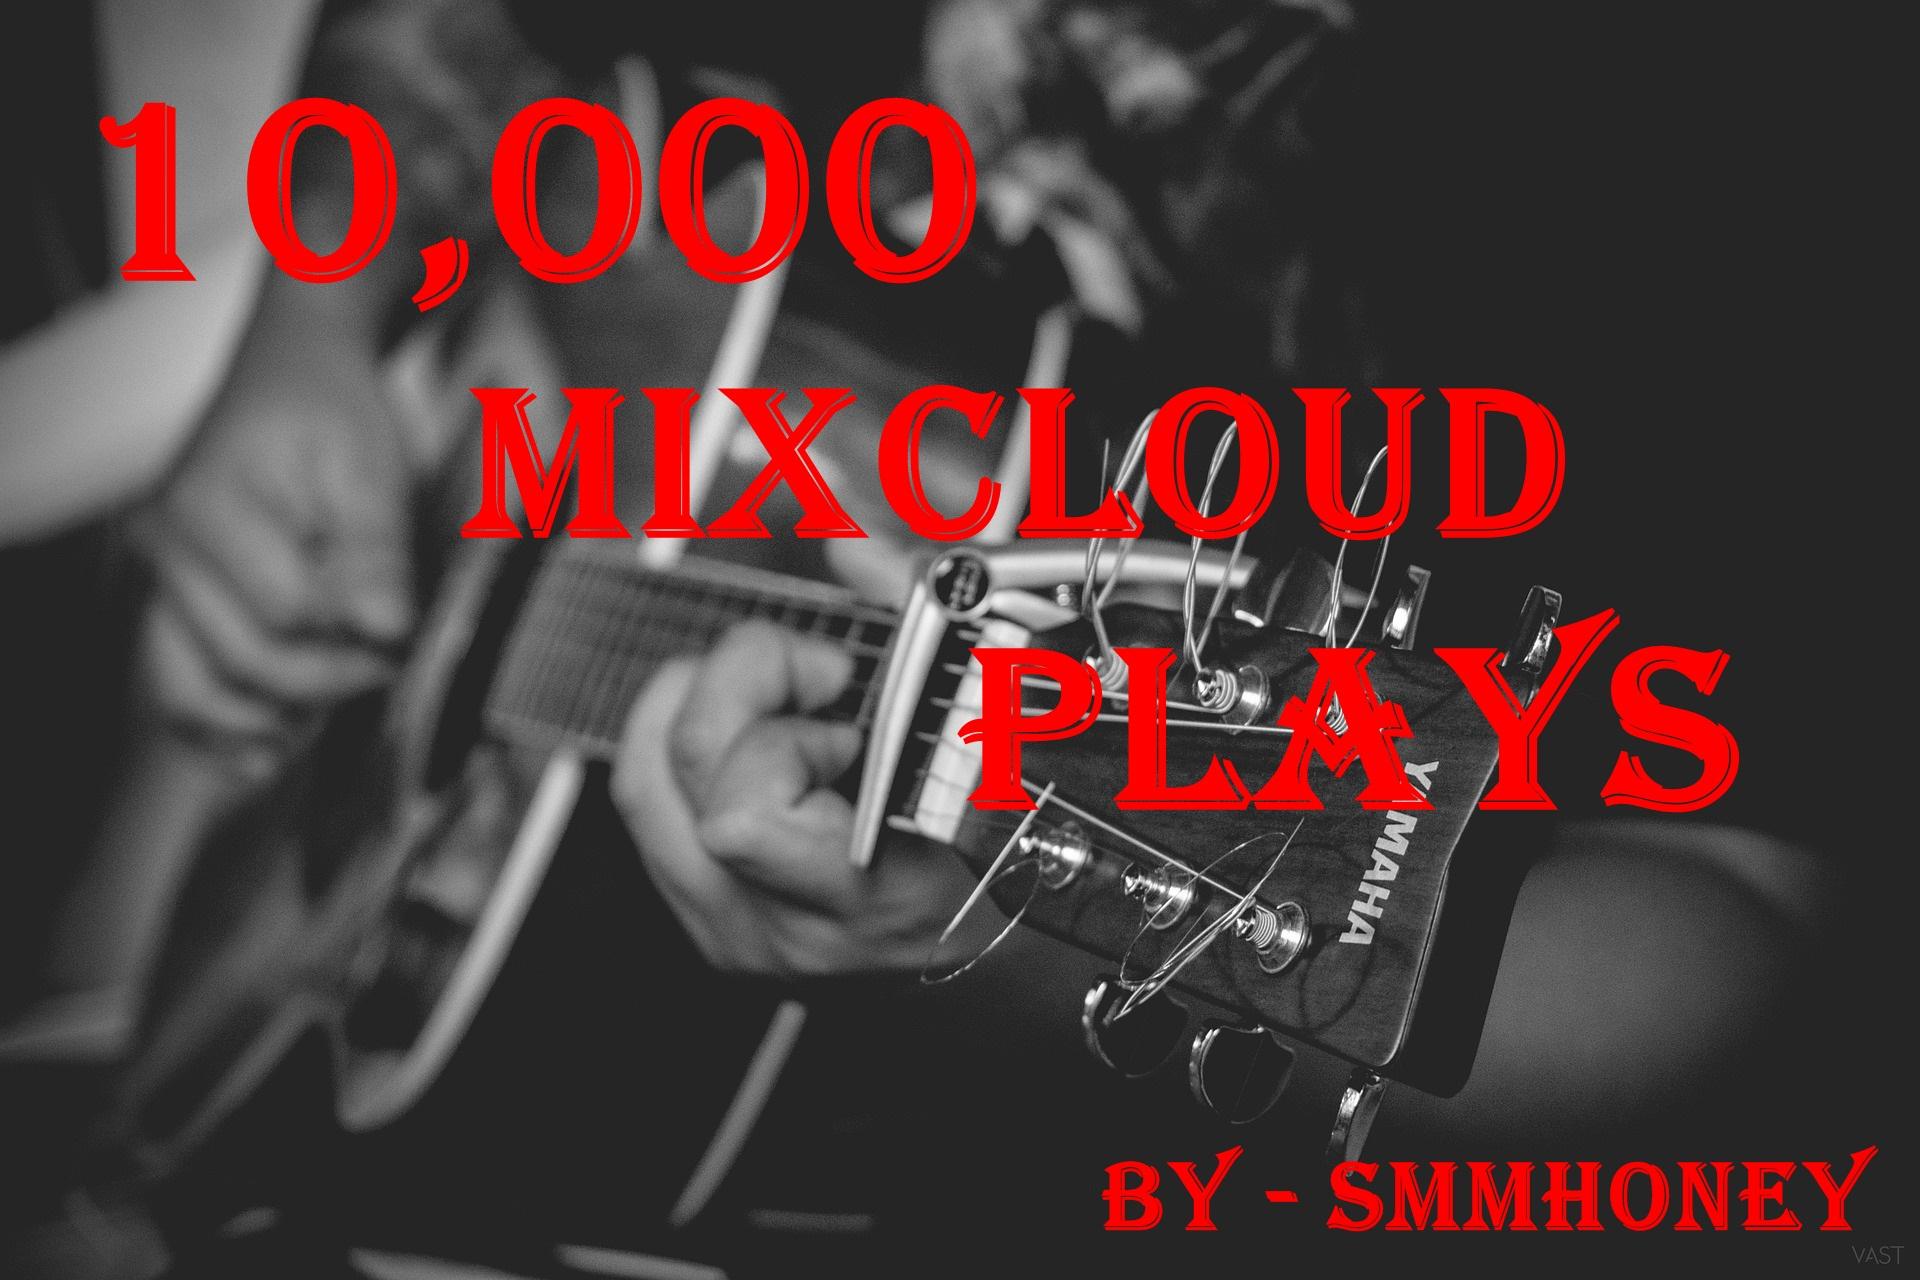 provide u 10,000 mix cloud plays